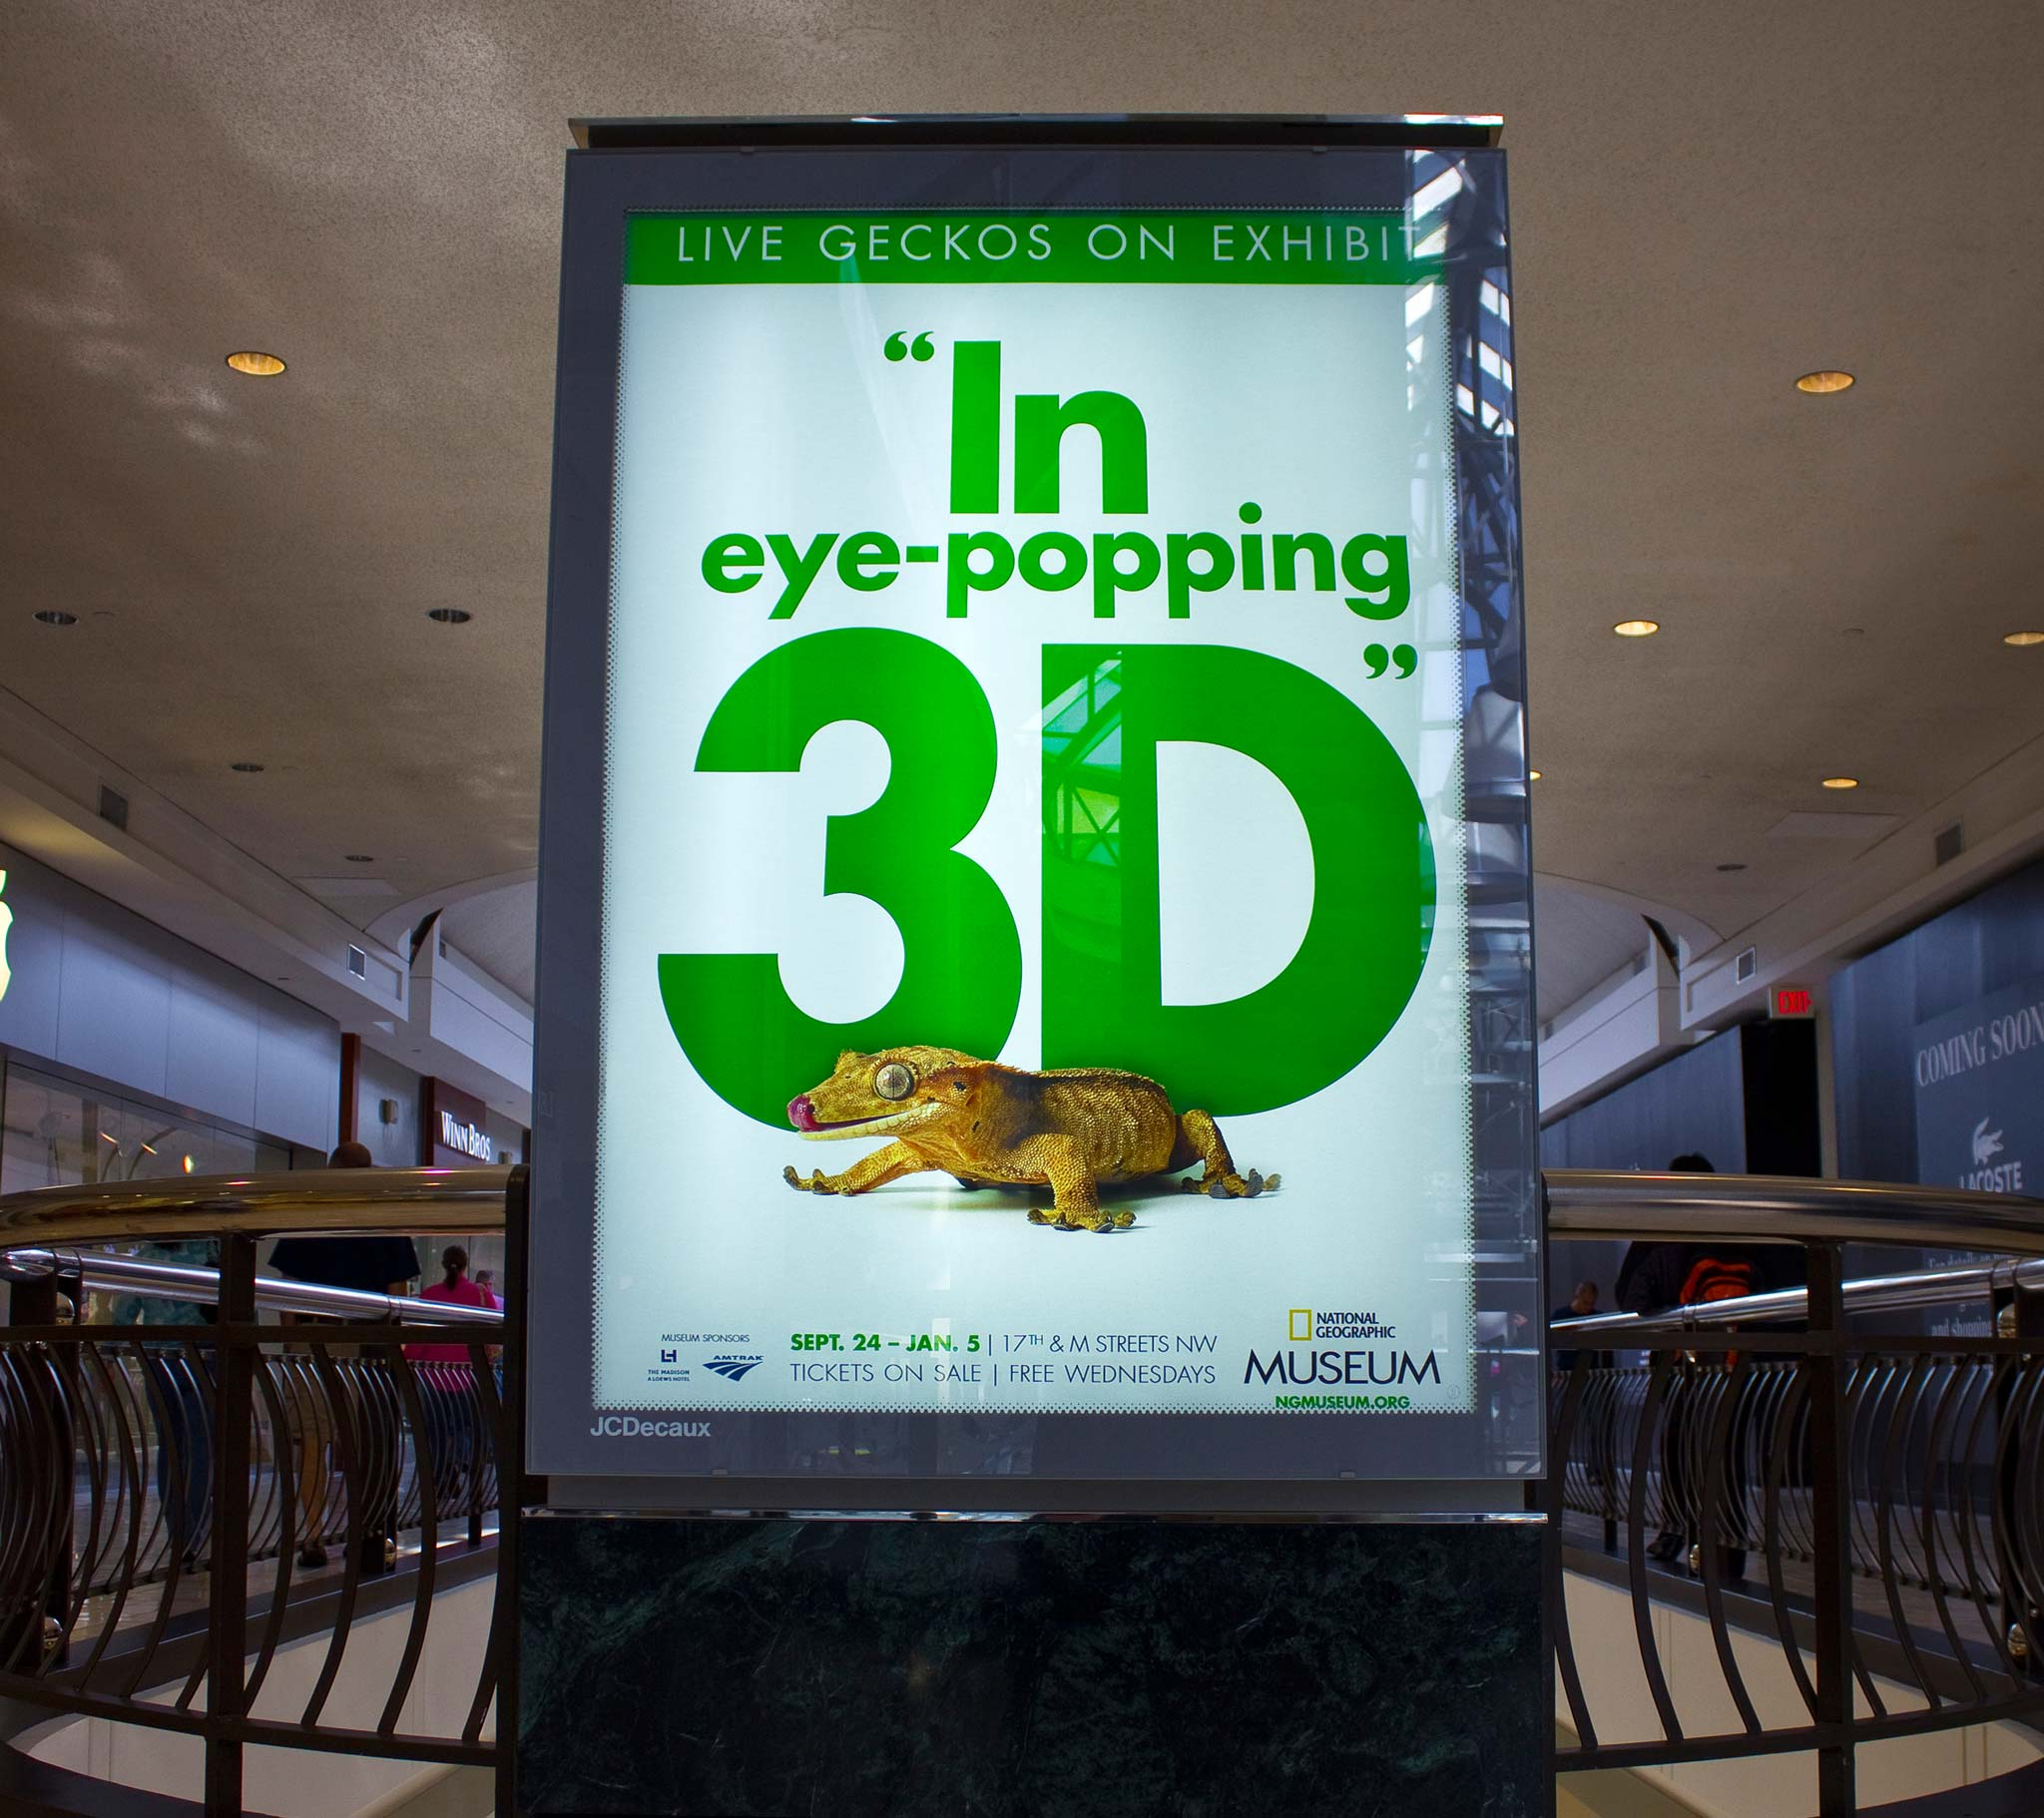 Geckos_Images-3D